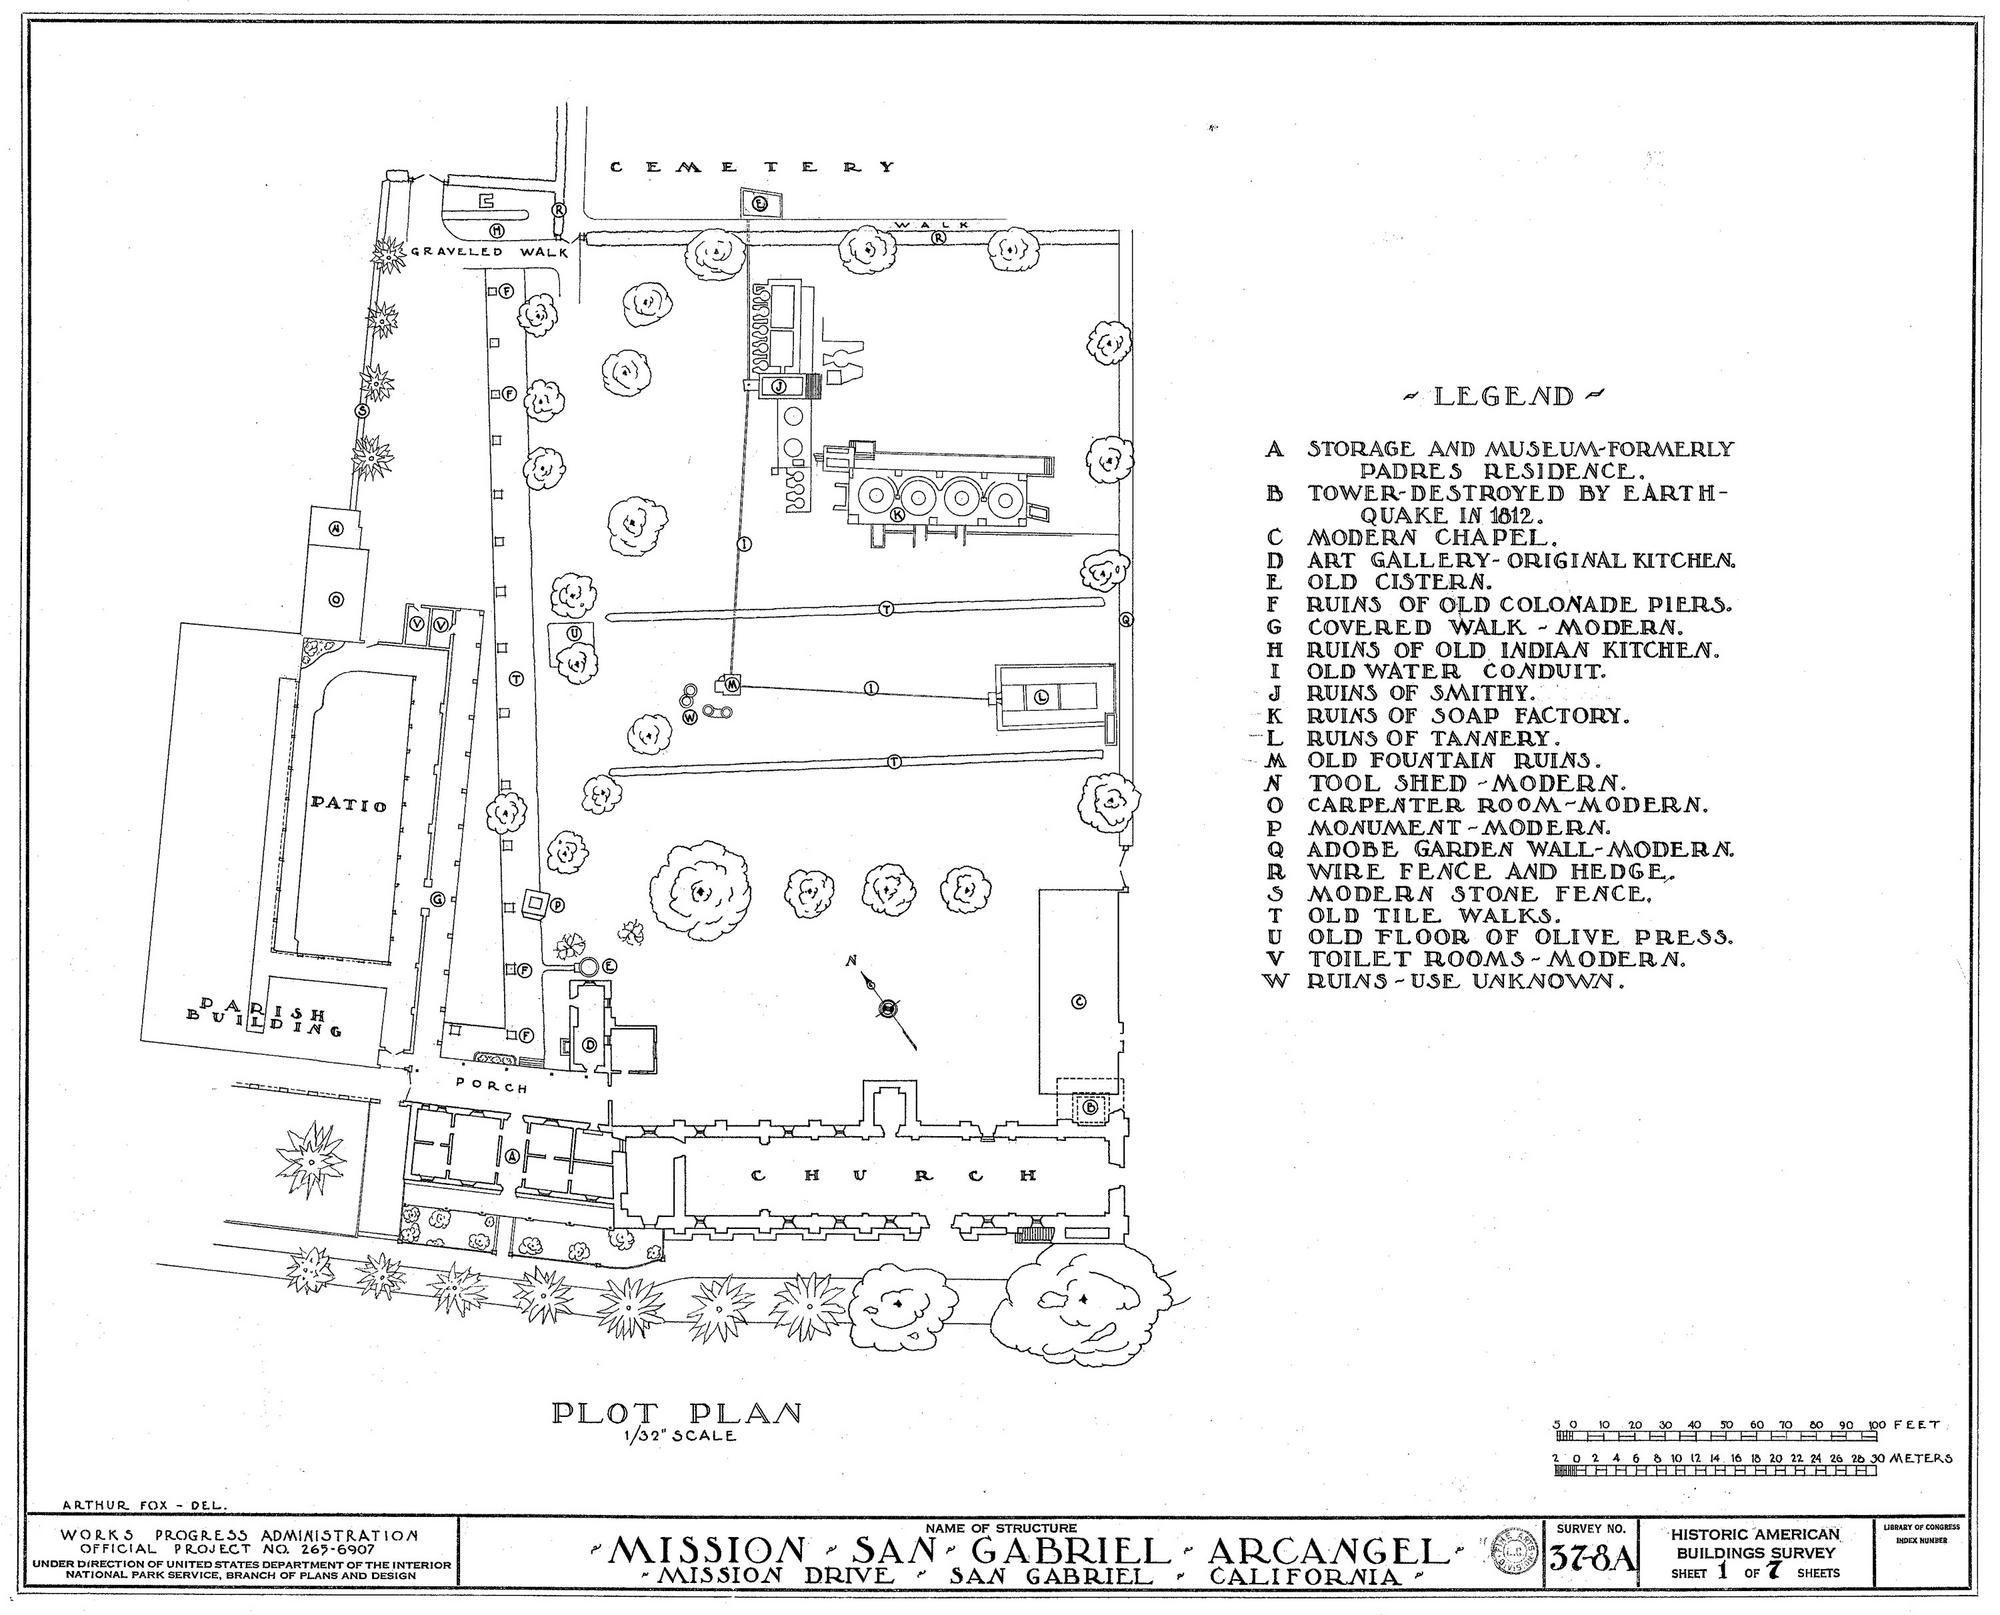 04 Plot Plan Of San Gabriel Web 0 Jpg 2 000 1 615 Pixels Plot Plan How To Plan California Missions Project